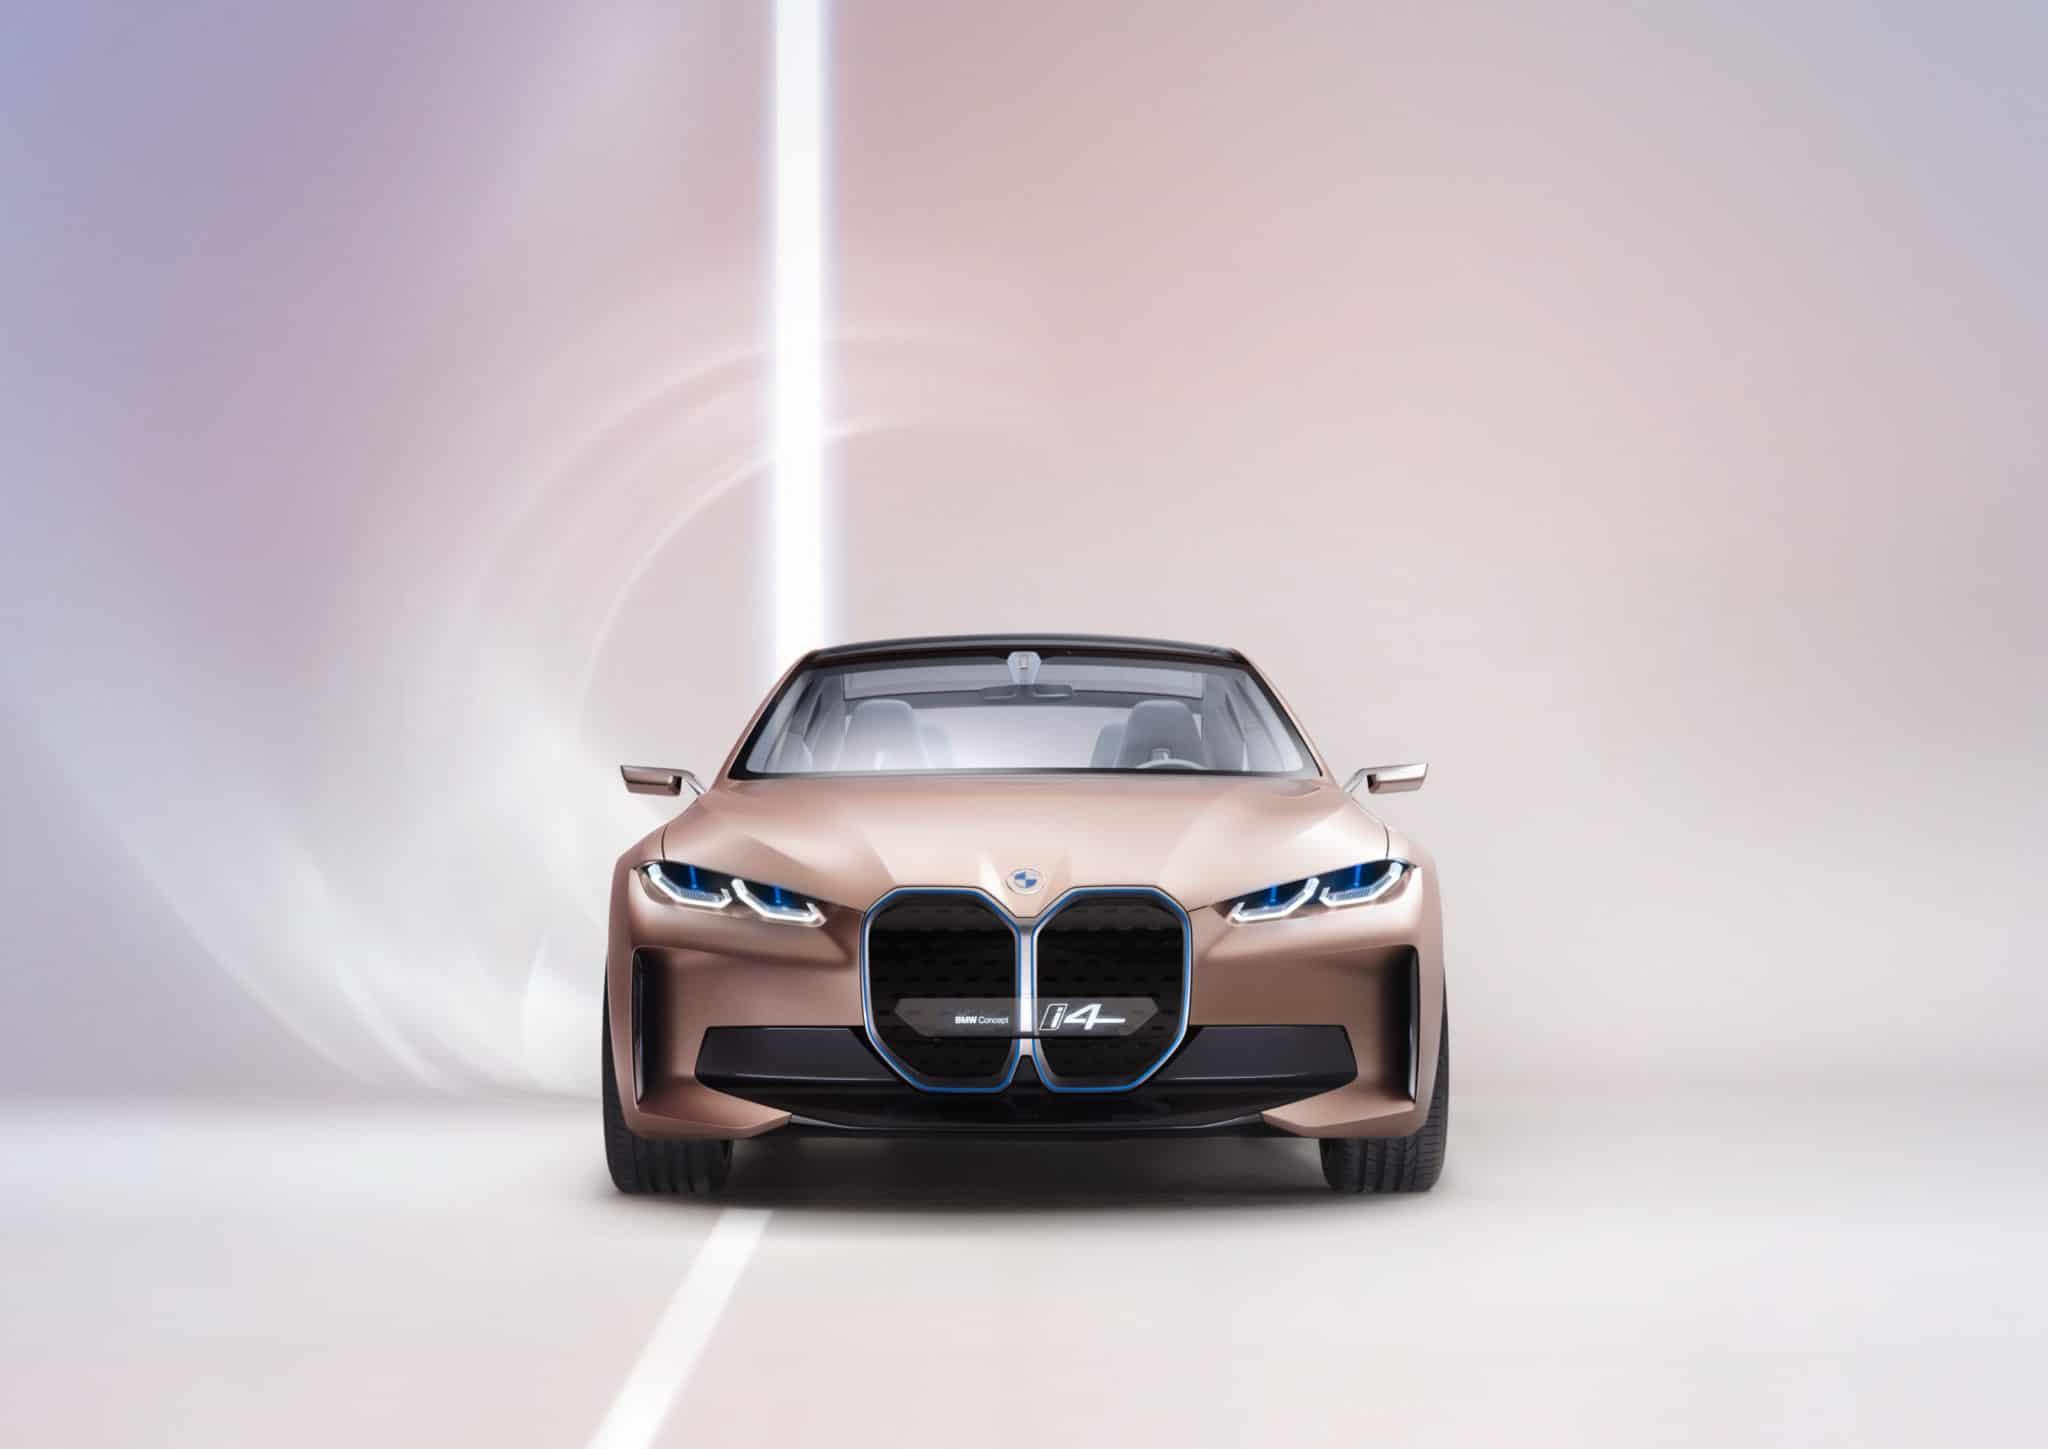 2021 BMW i4 Electric Car Concept